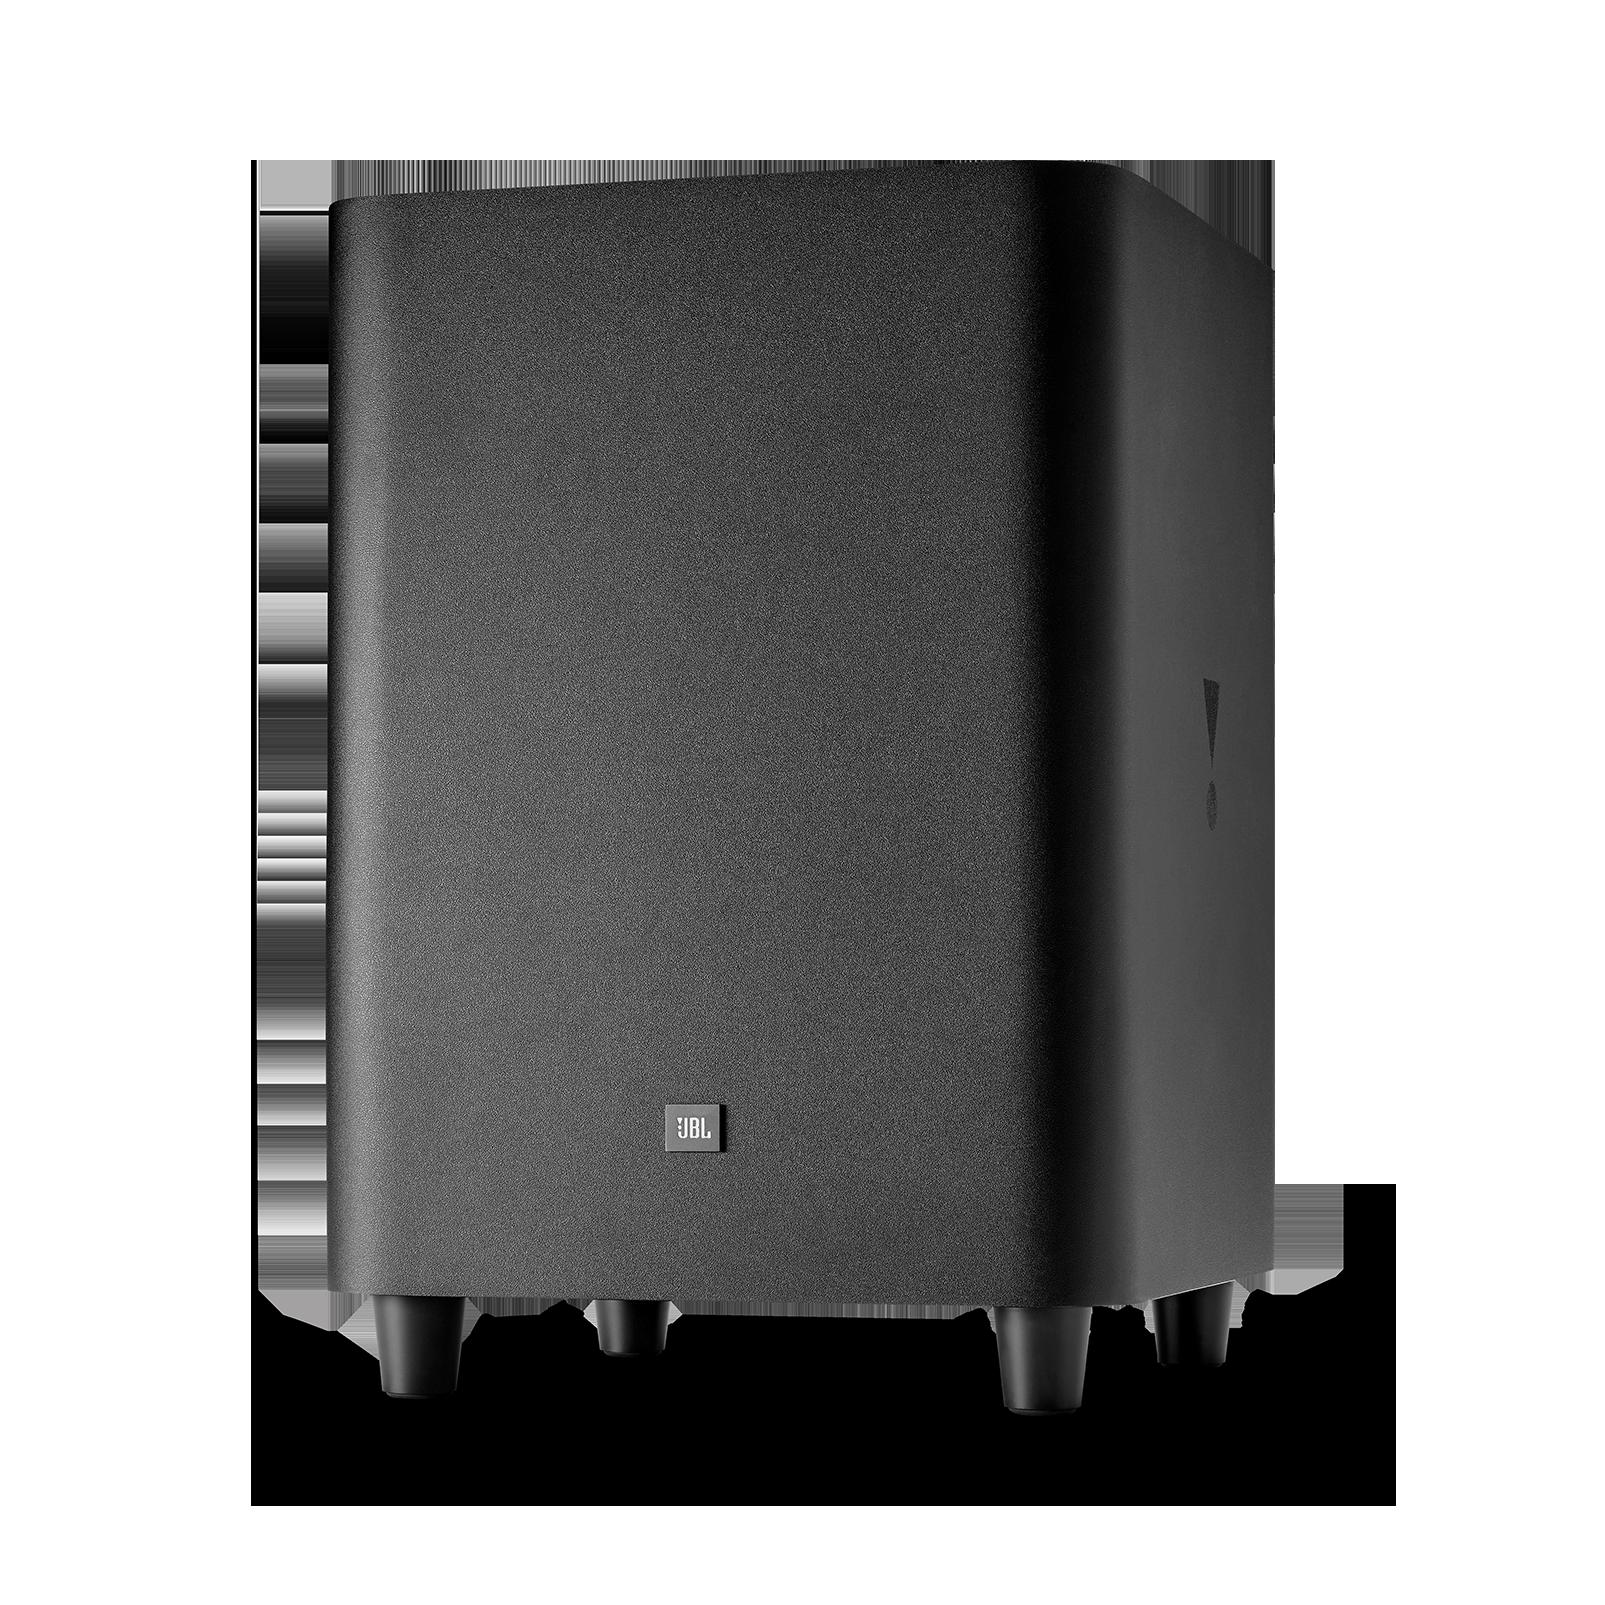 JBL Bar 3.1 - Black - 3.1-Channel 4K Ultra HD Soundbar with Wireless Subwoofer - Detailshot 2